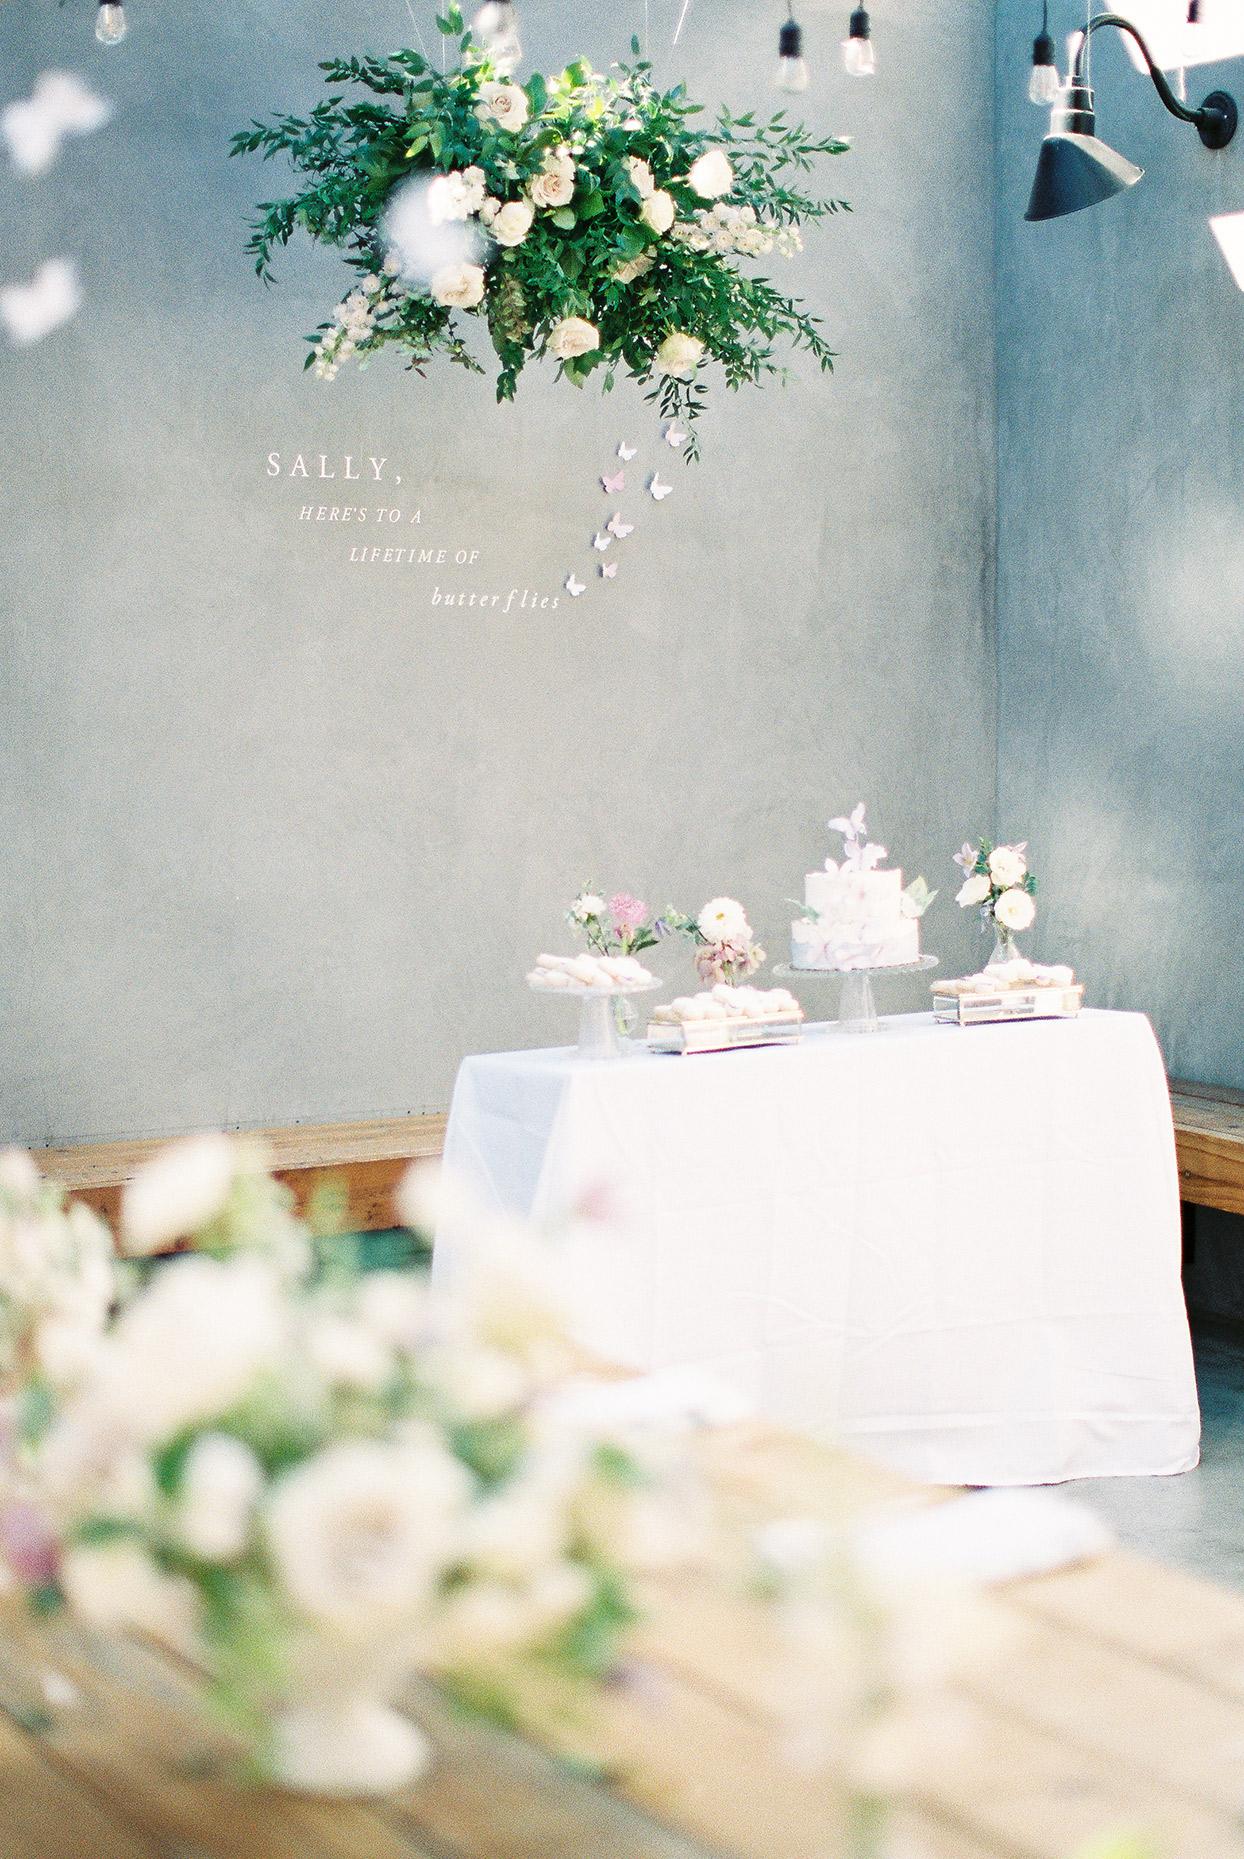 sally bridal shower flower installation on wall